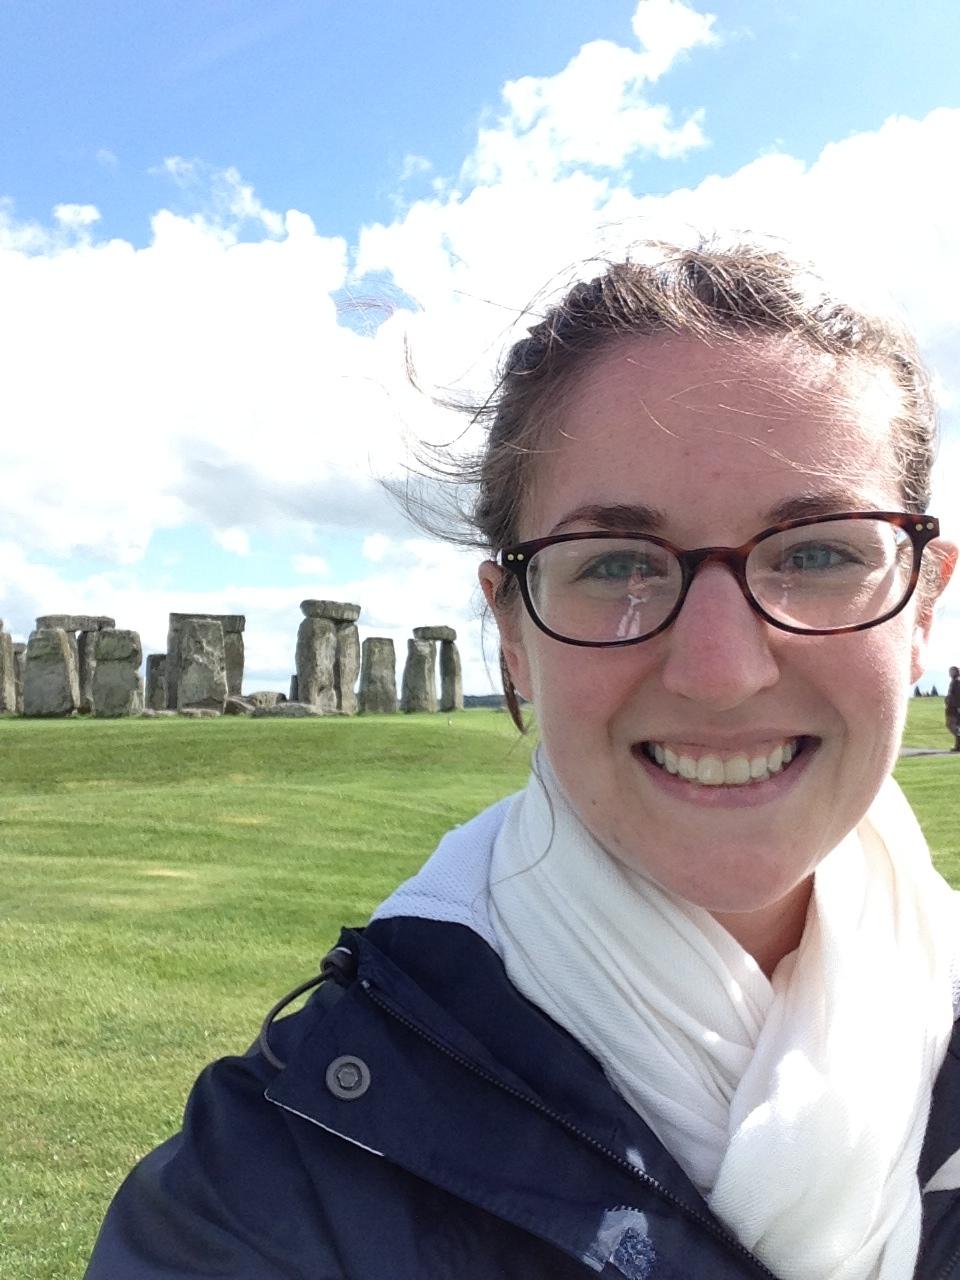 A Beautiful day at Stonehenge